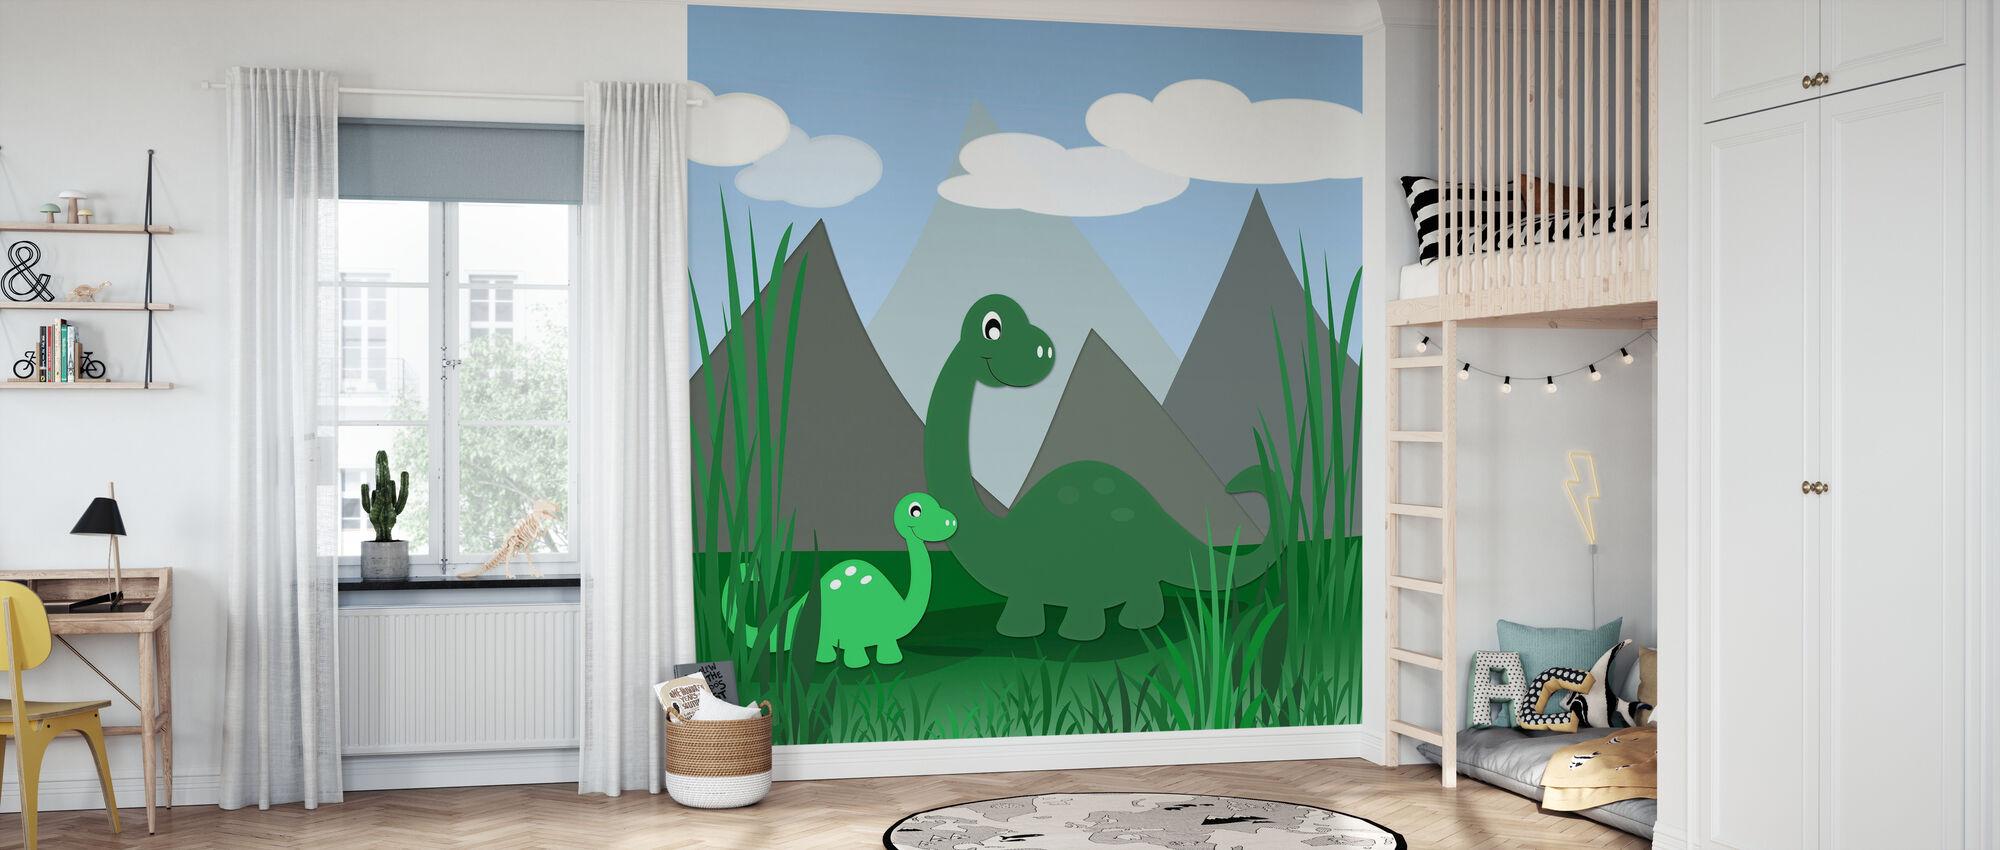 Dinoland - Wallpaper - Kids Room